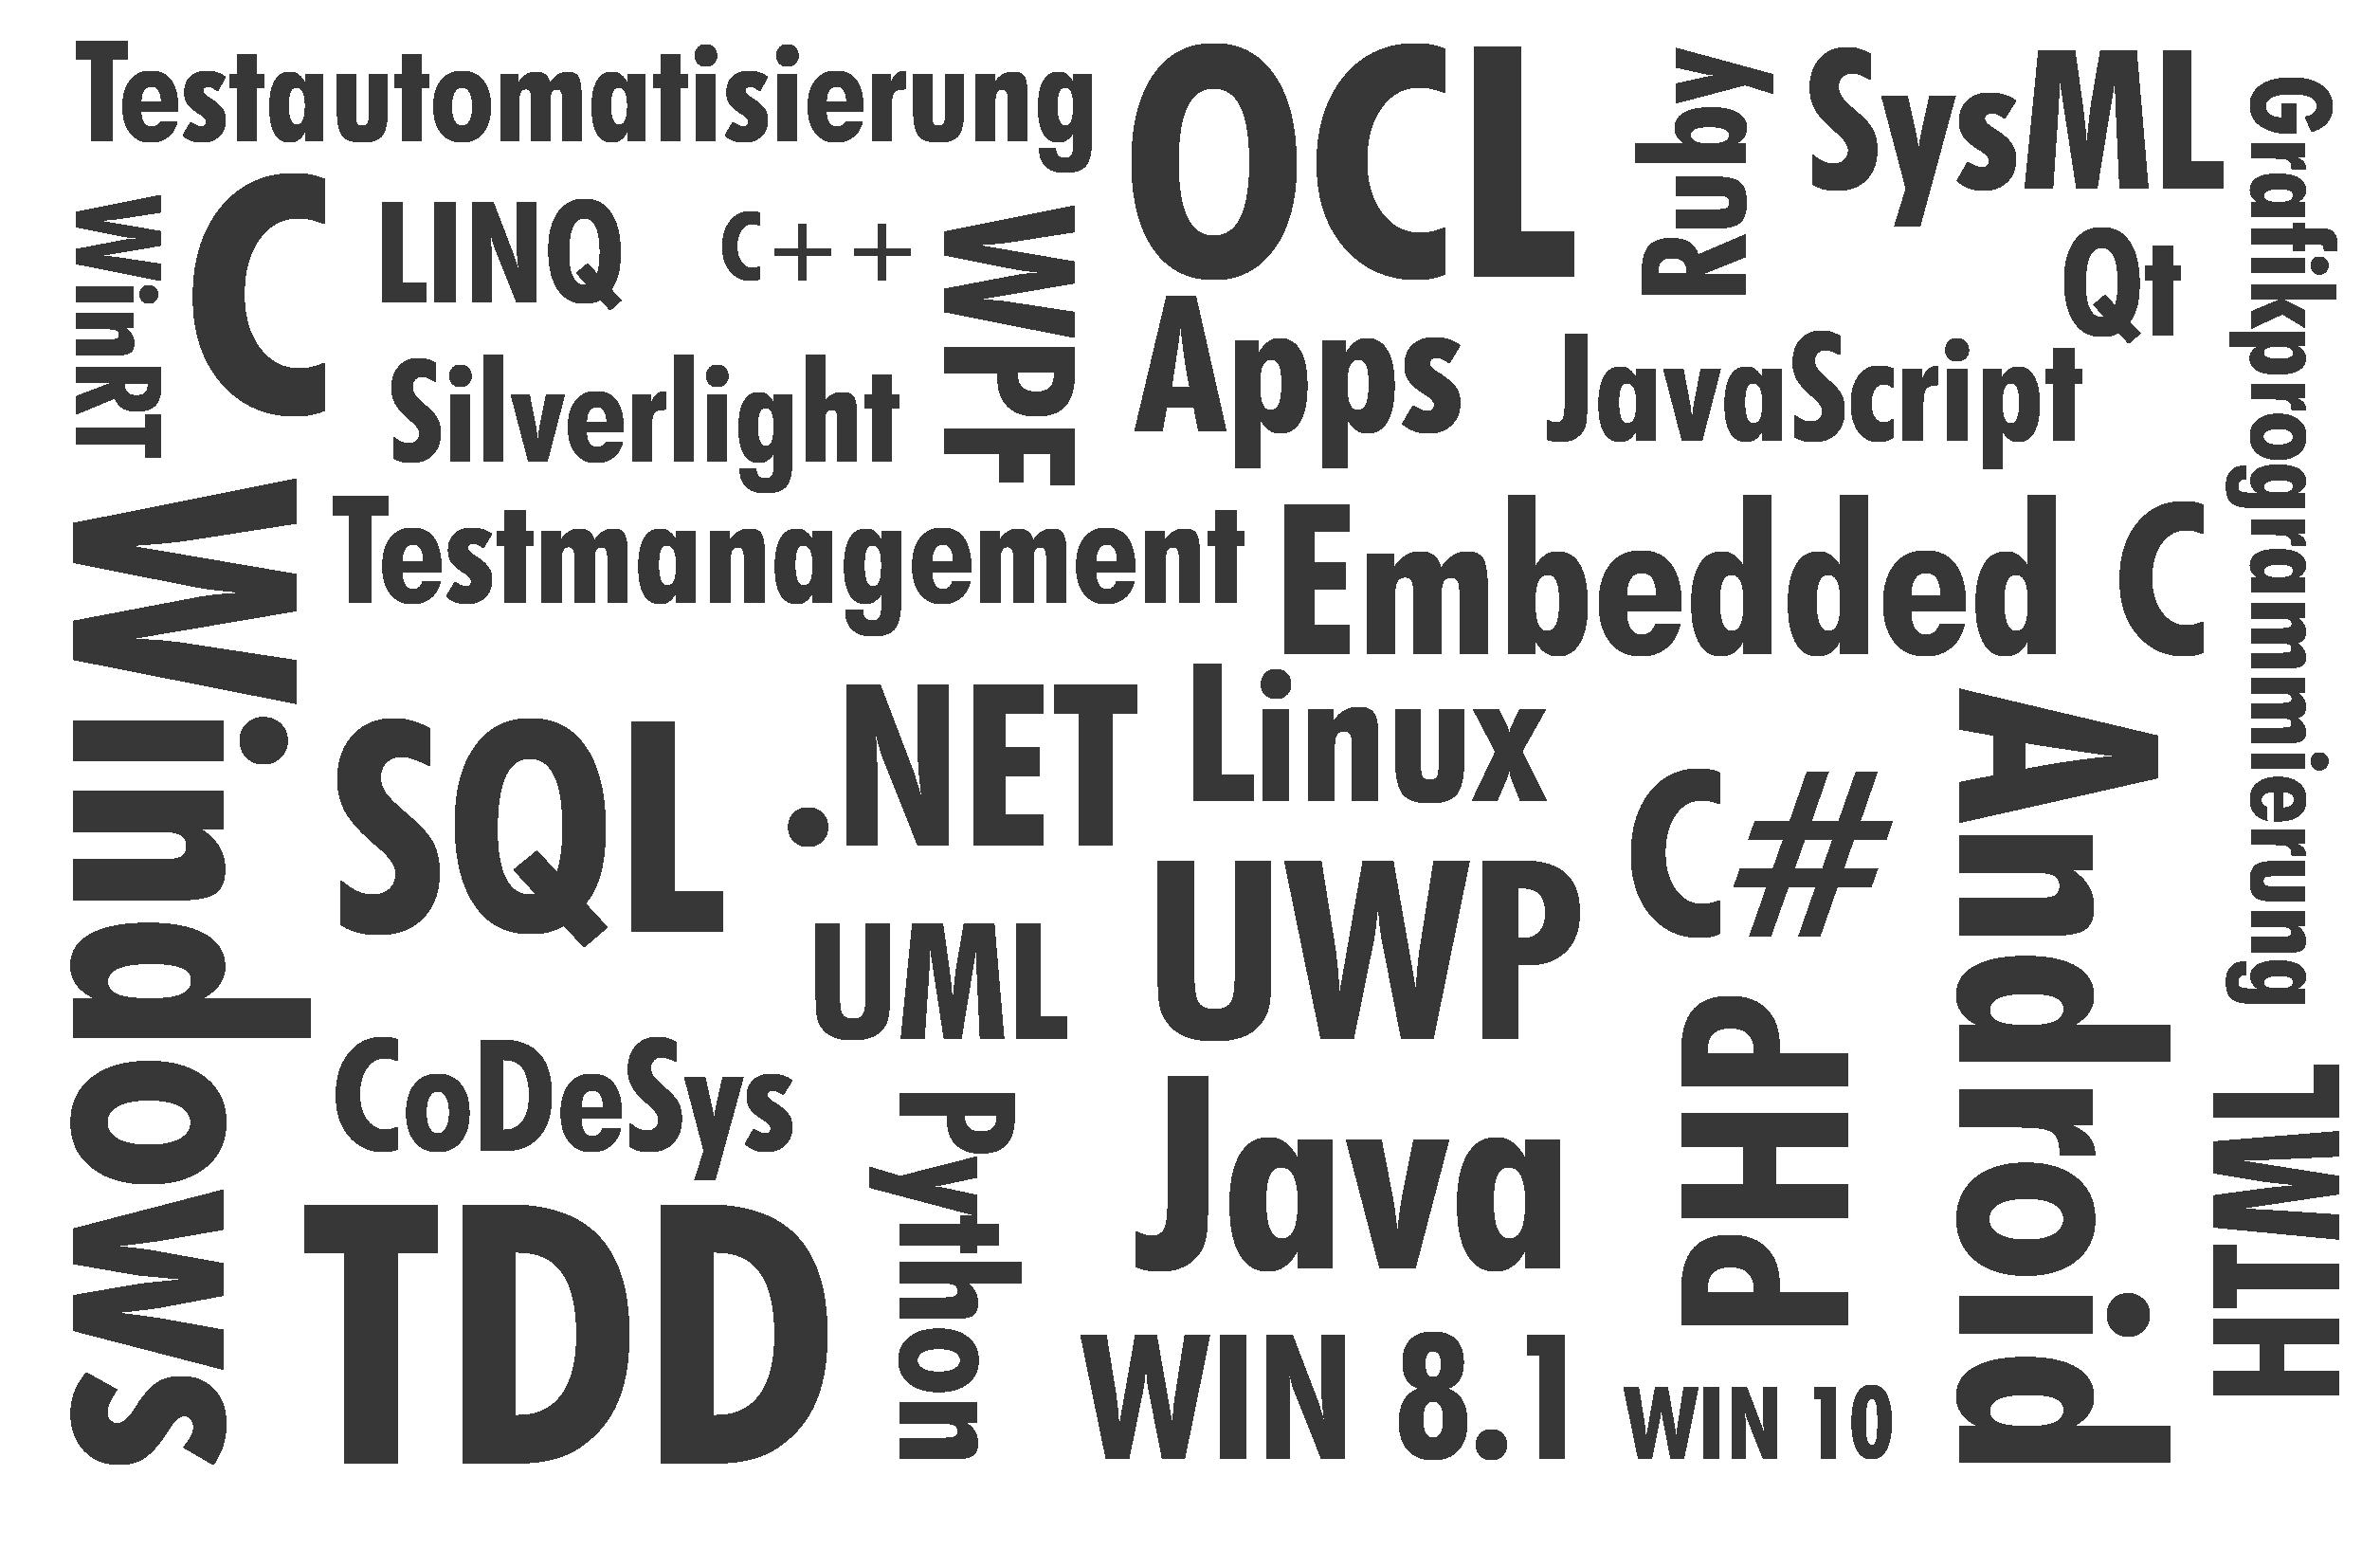 Software-Entwicklulng Wortwolke